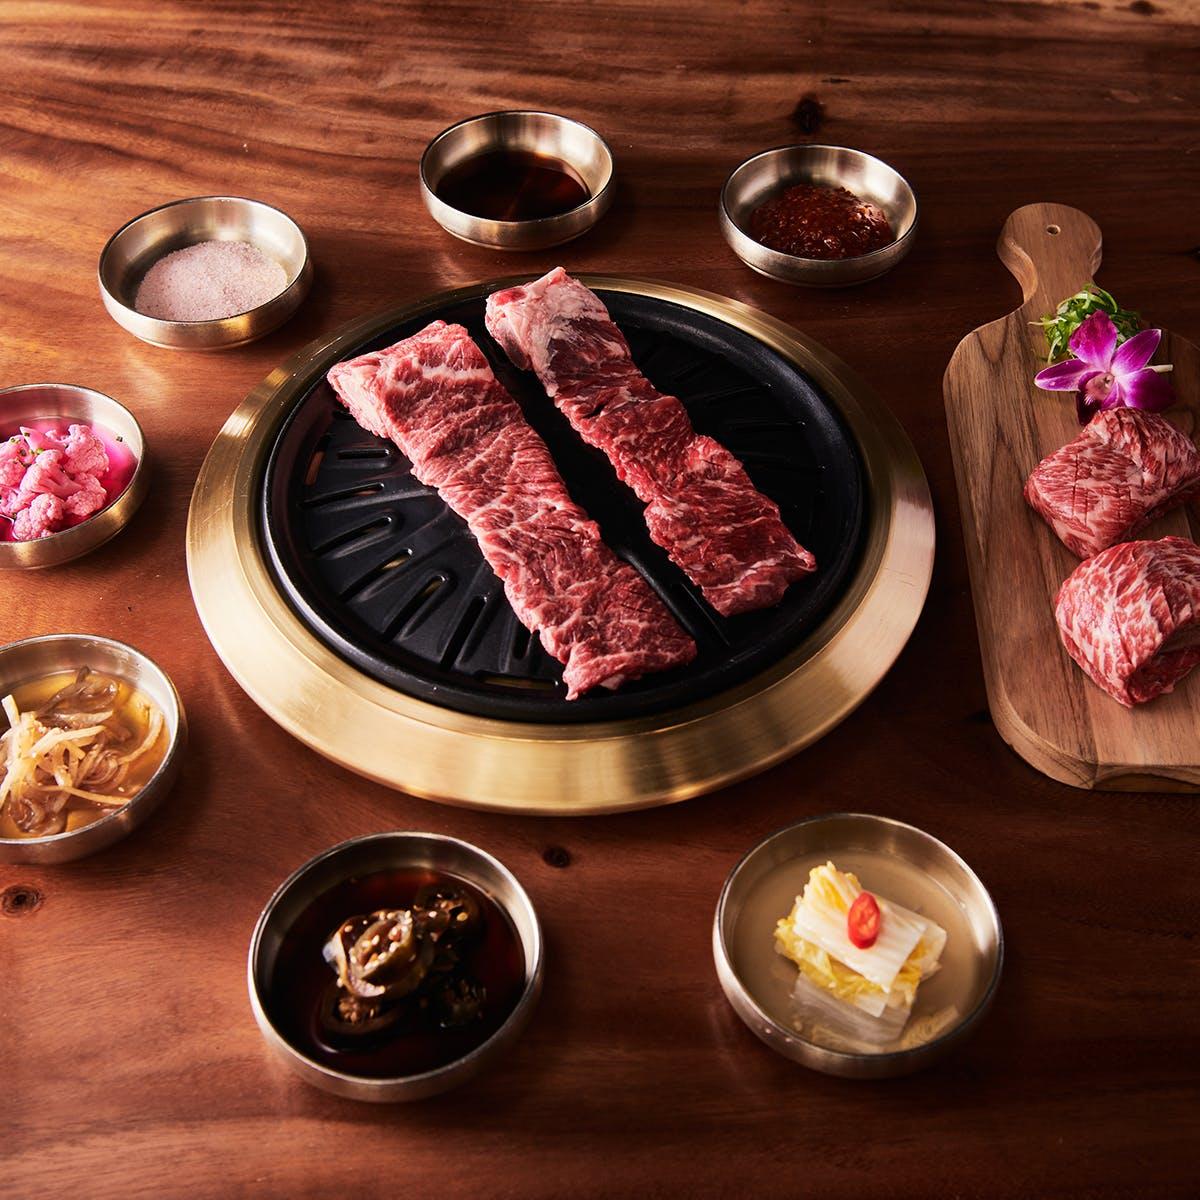 Samwon Garden Korean BBQ - Korean BBQ Galbi Beef Kit for 6-8